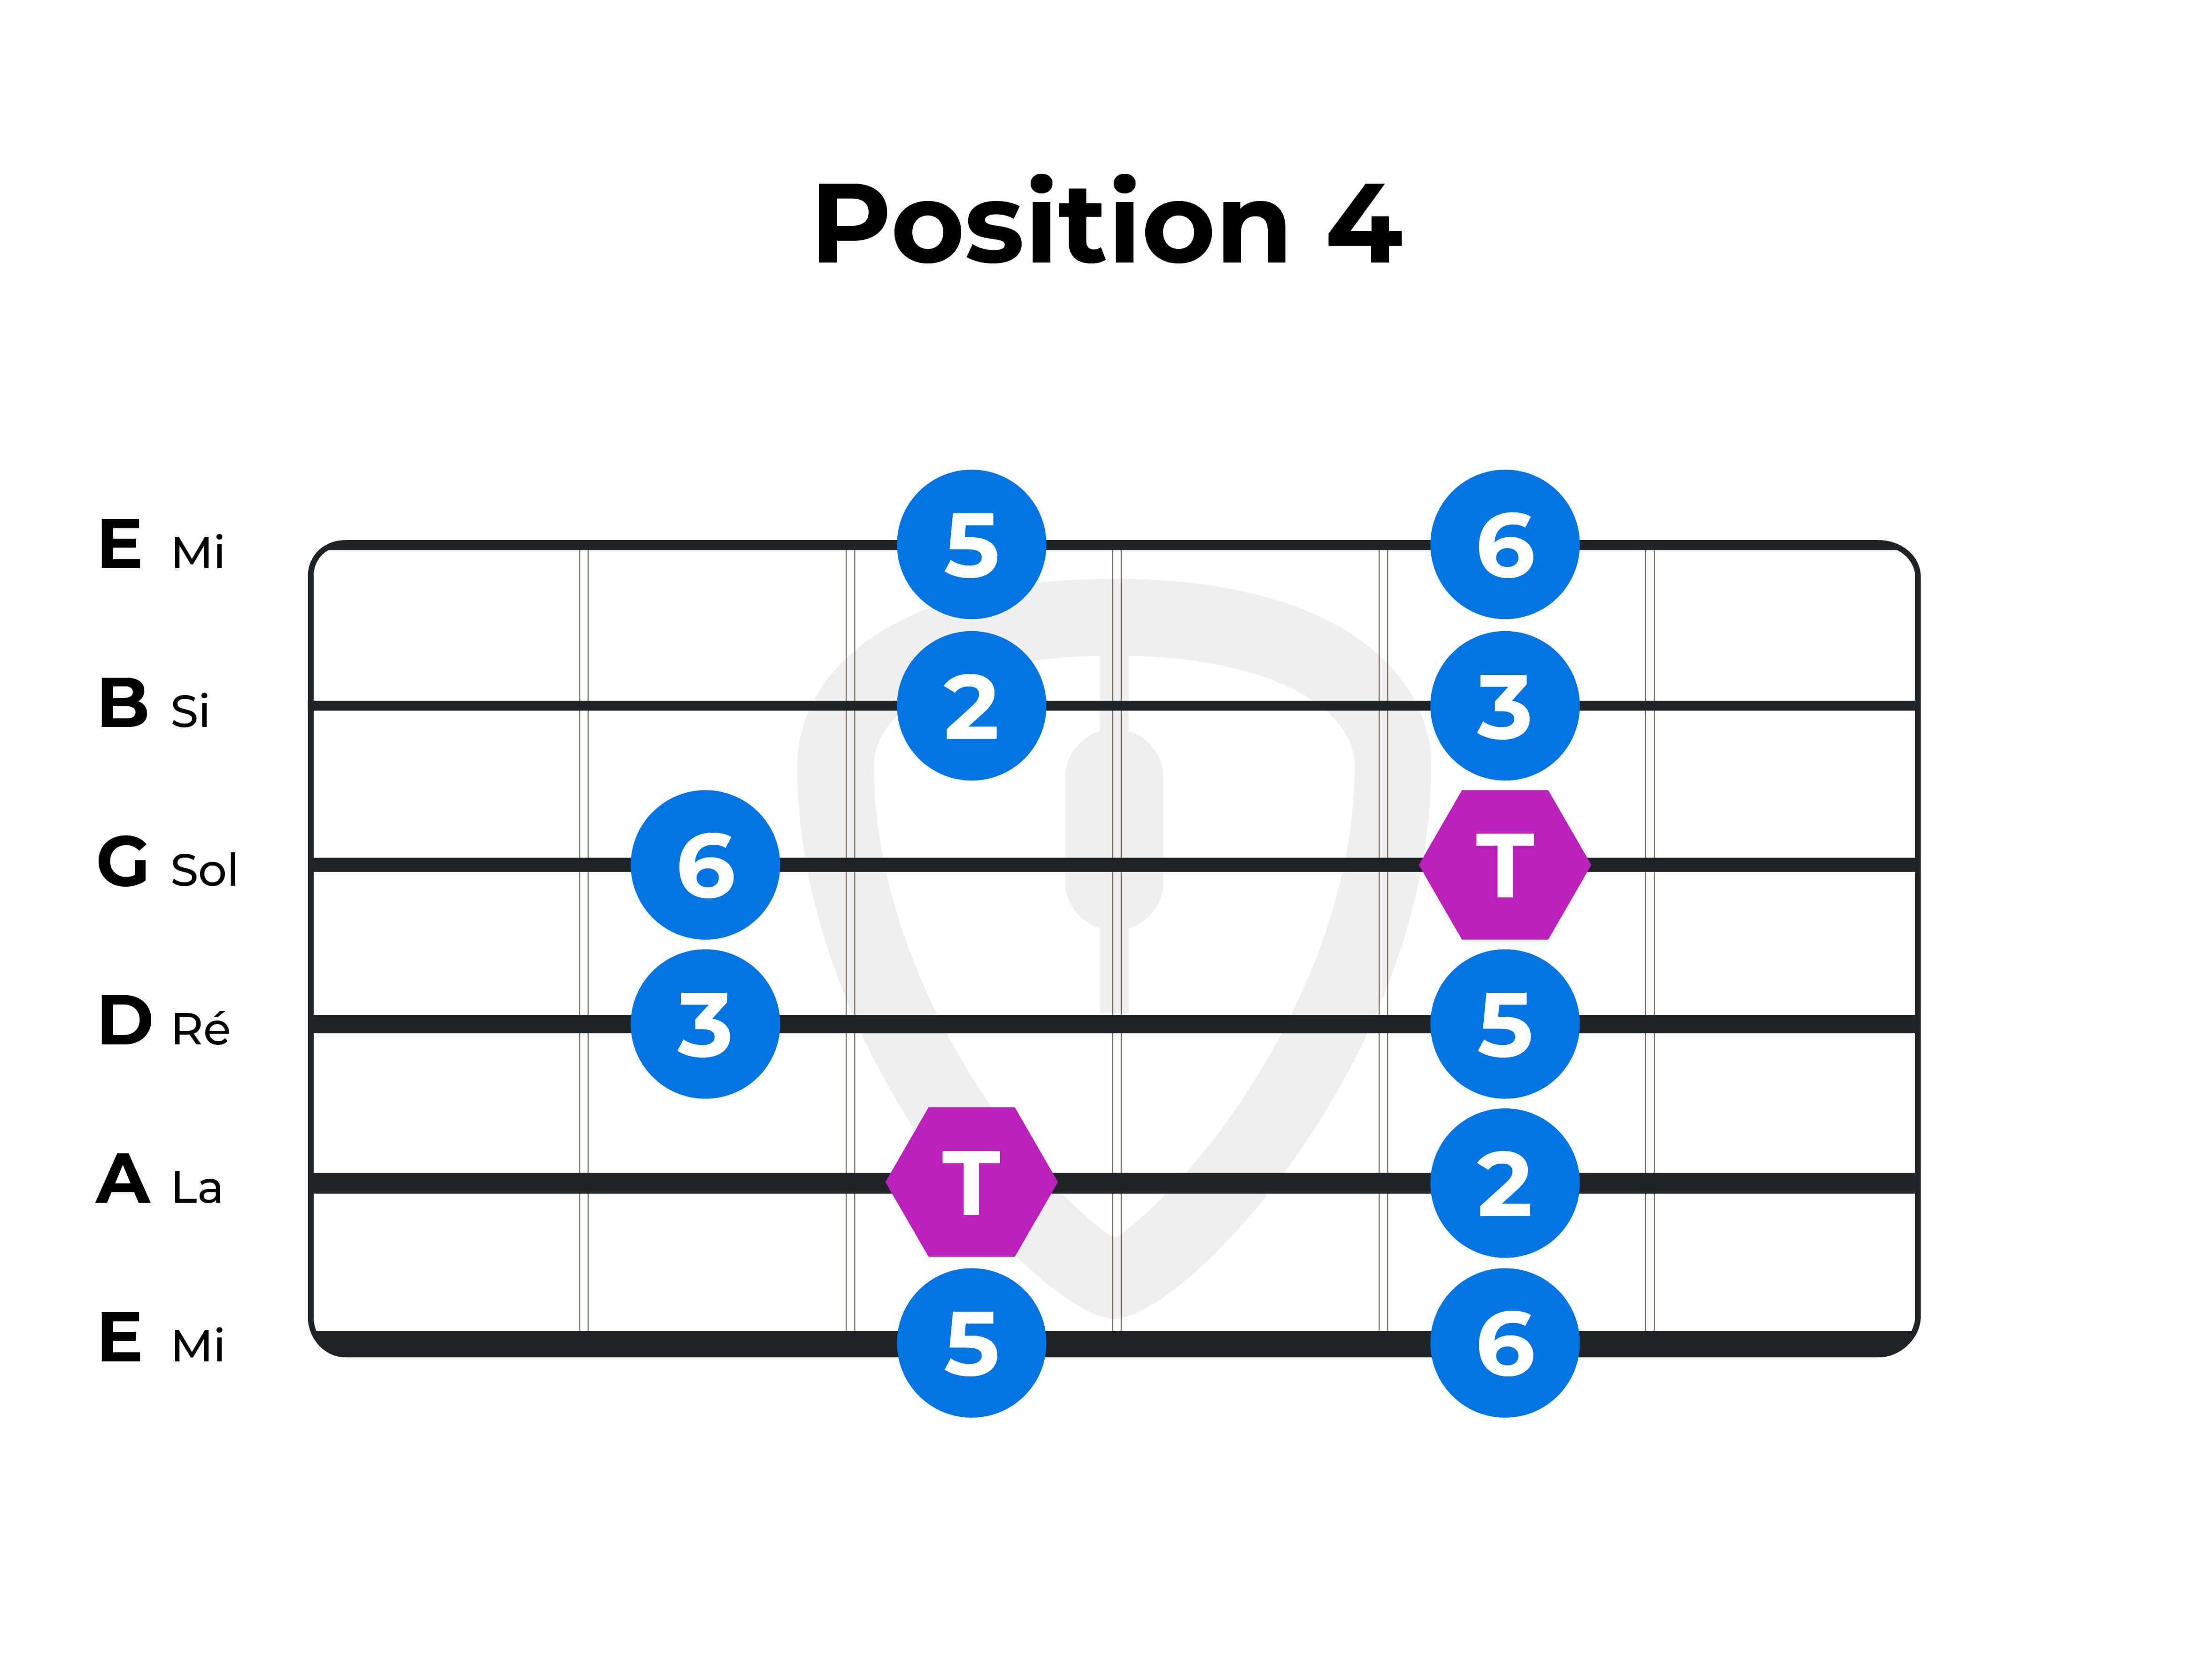 gamme pentatonique majeure guitare position 4